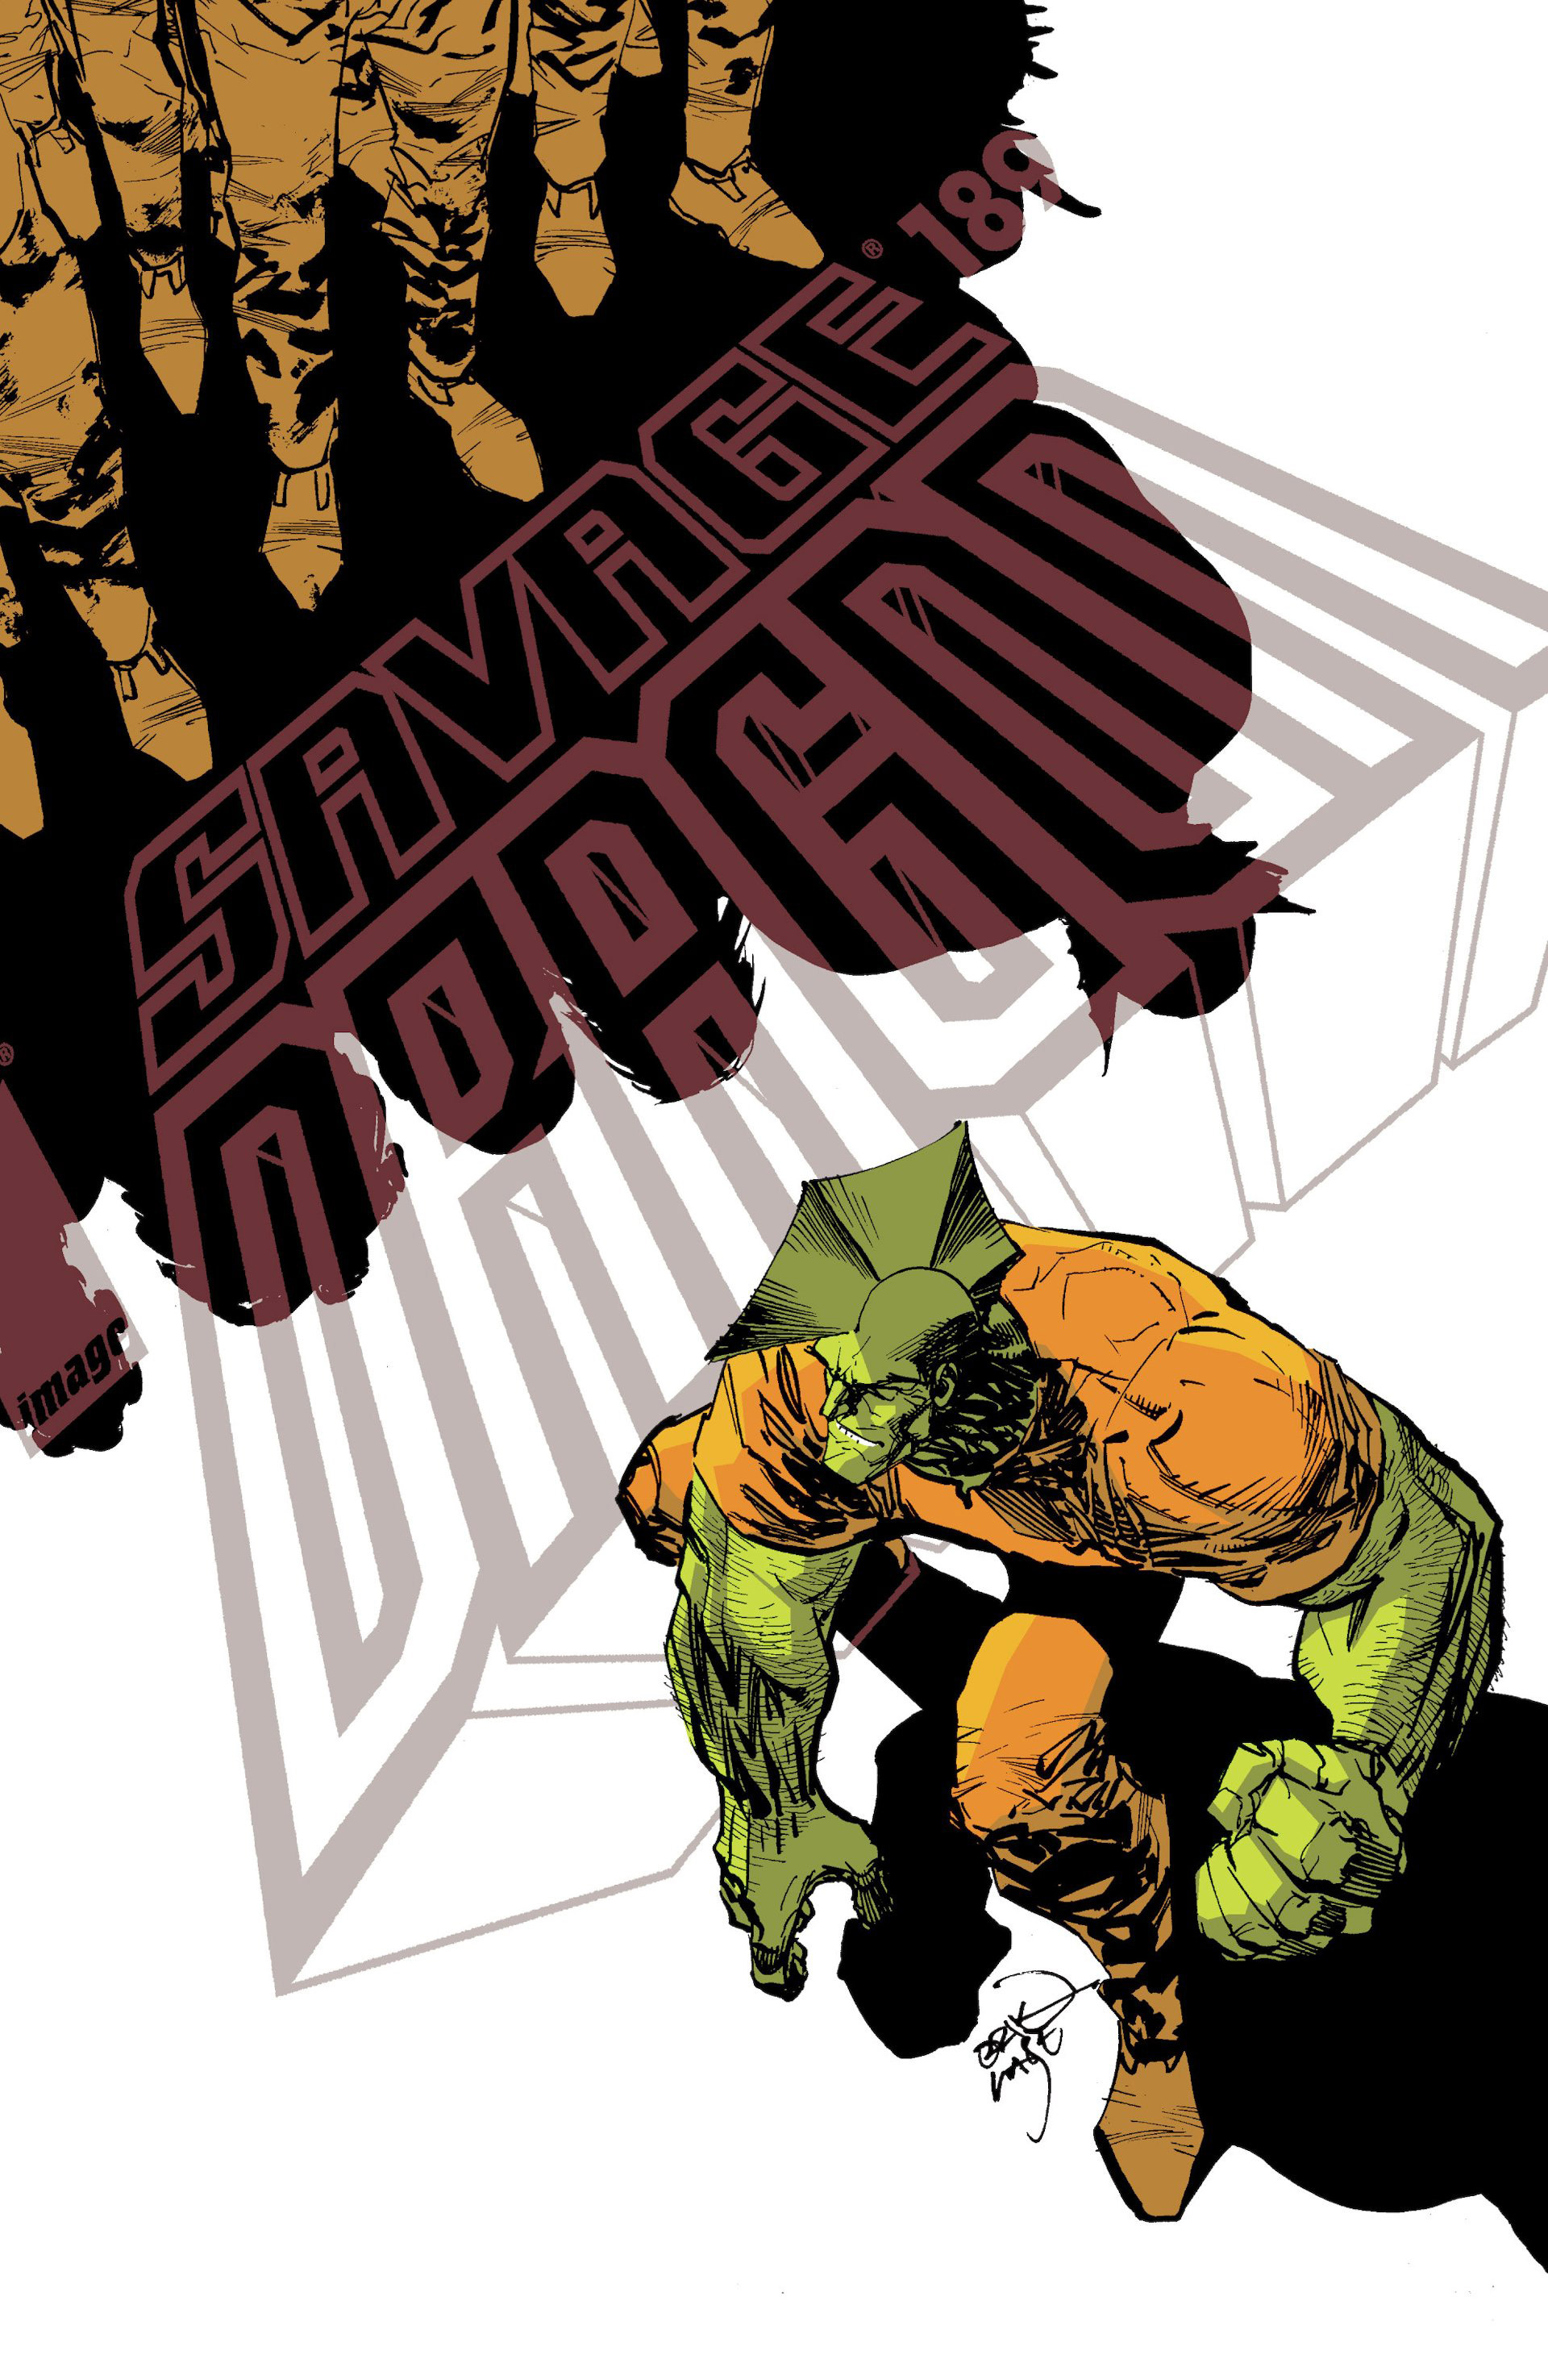 Cover Savage Dragon Vol.2 #189